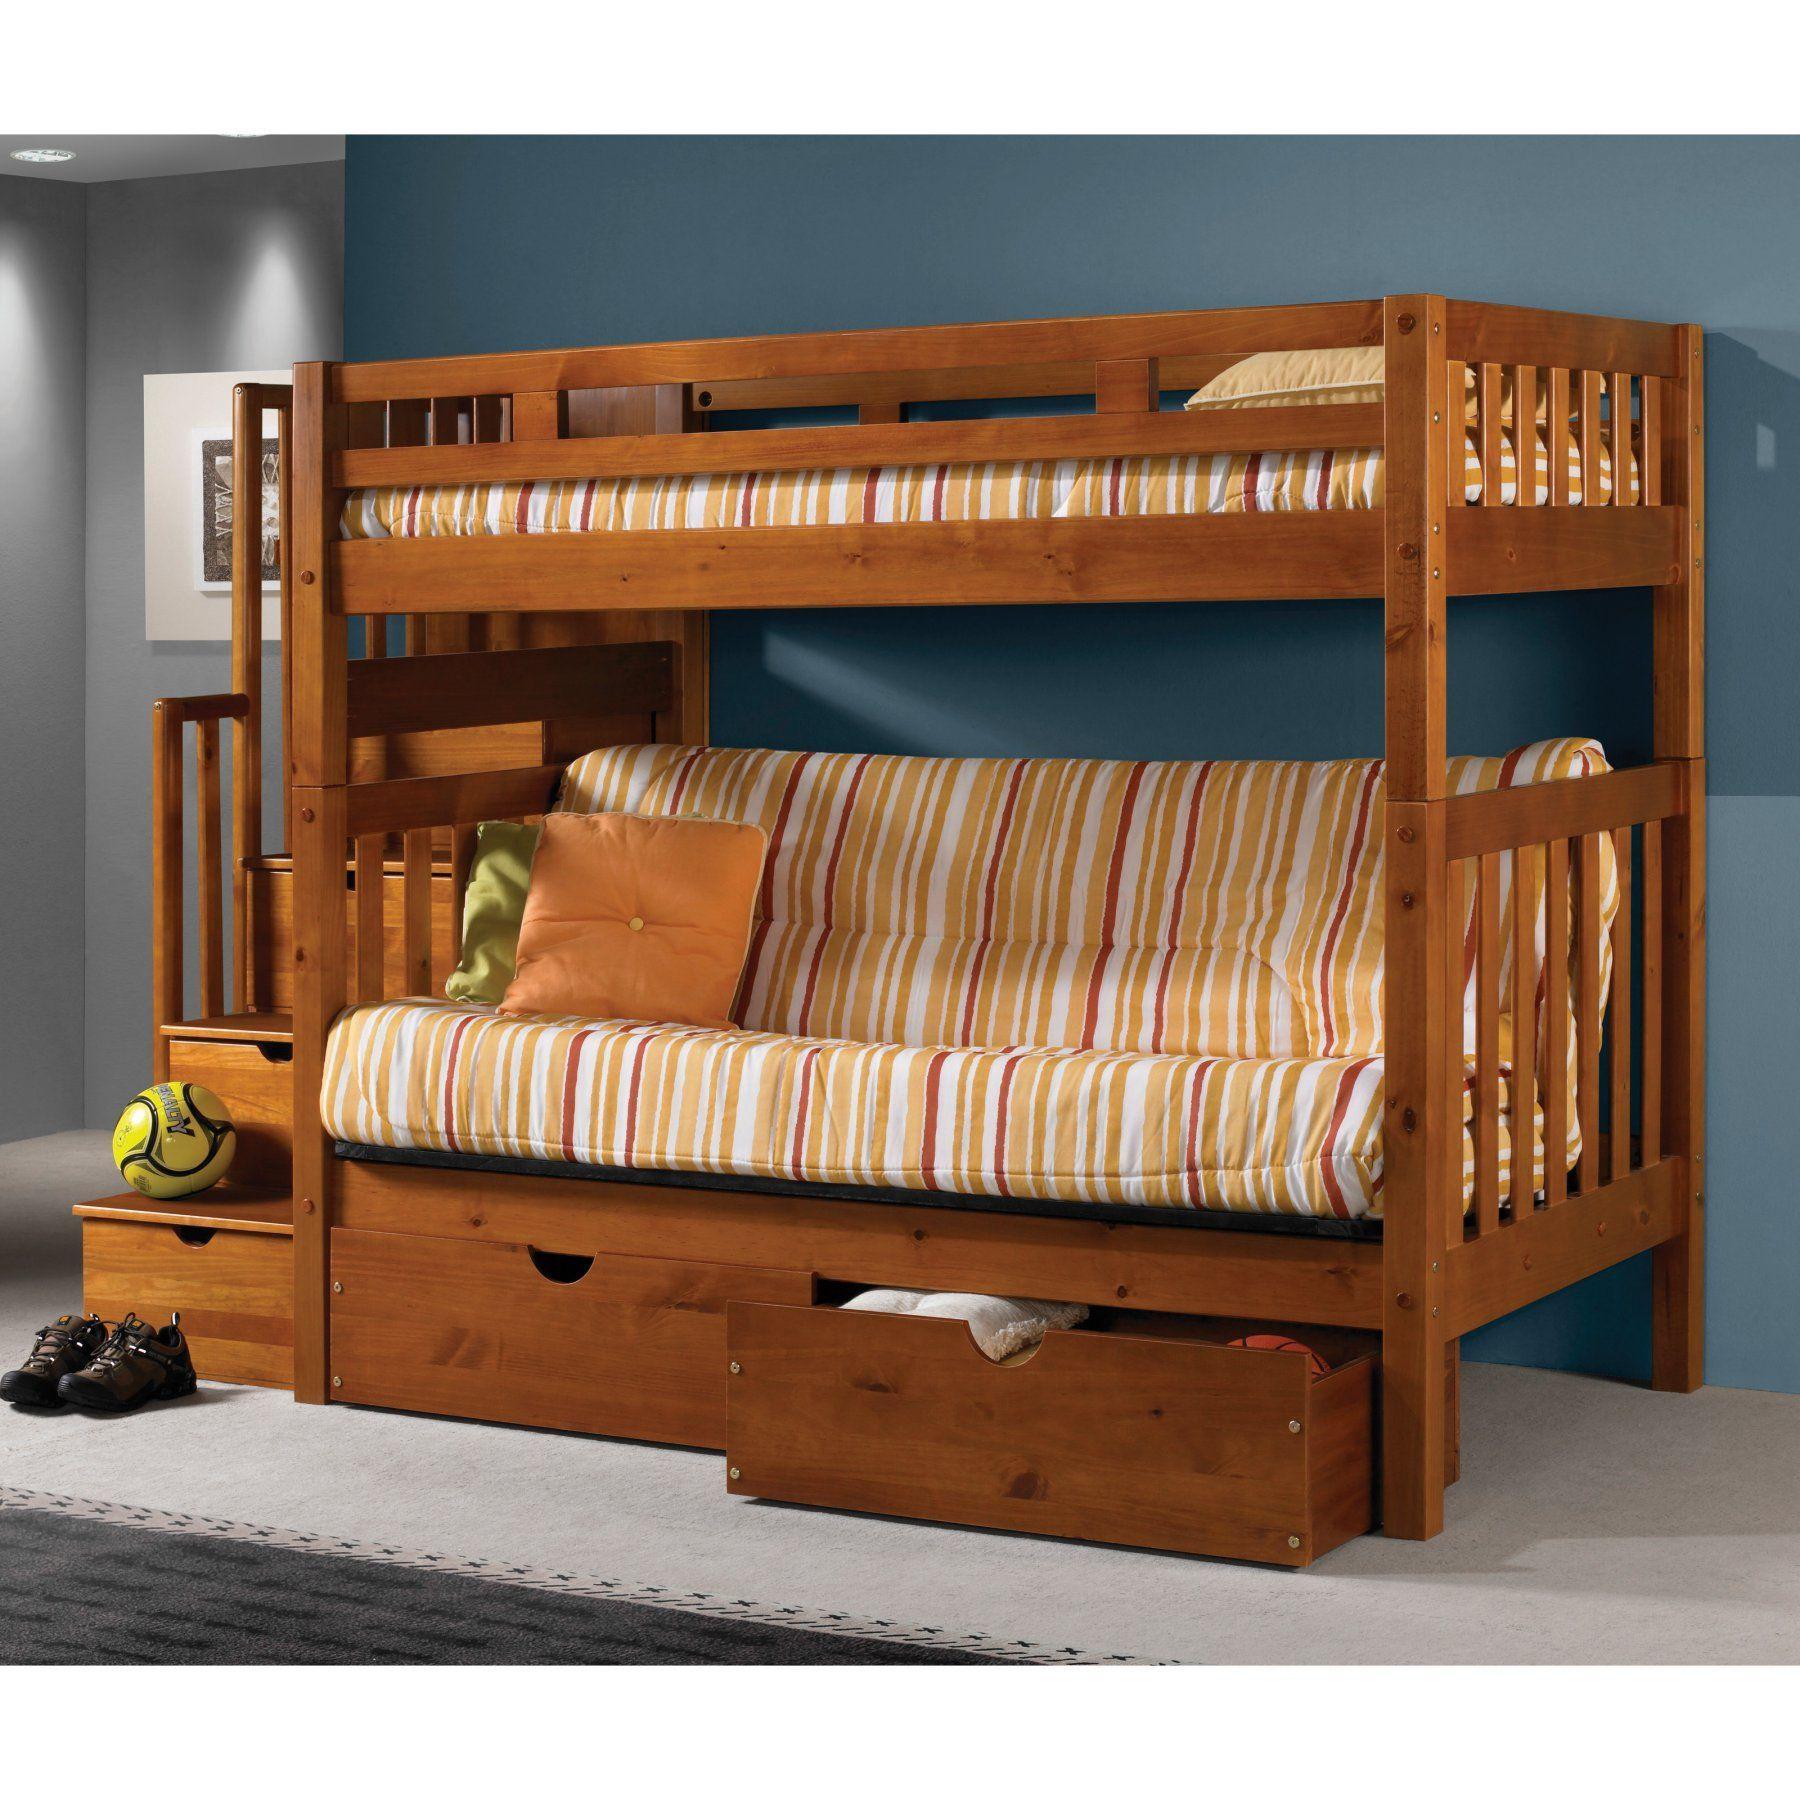 Donco Twin Futon Stairway Bunk Bed Honey DOT218 in